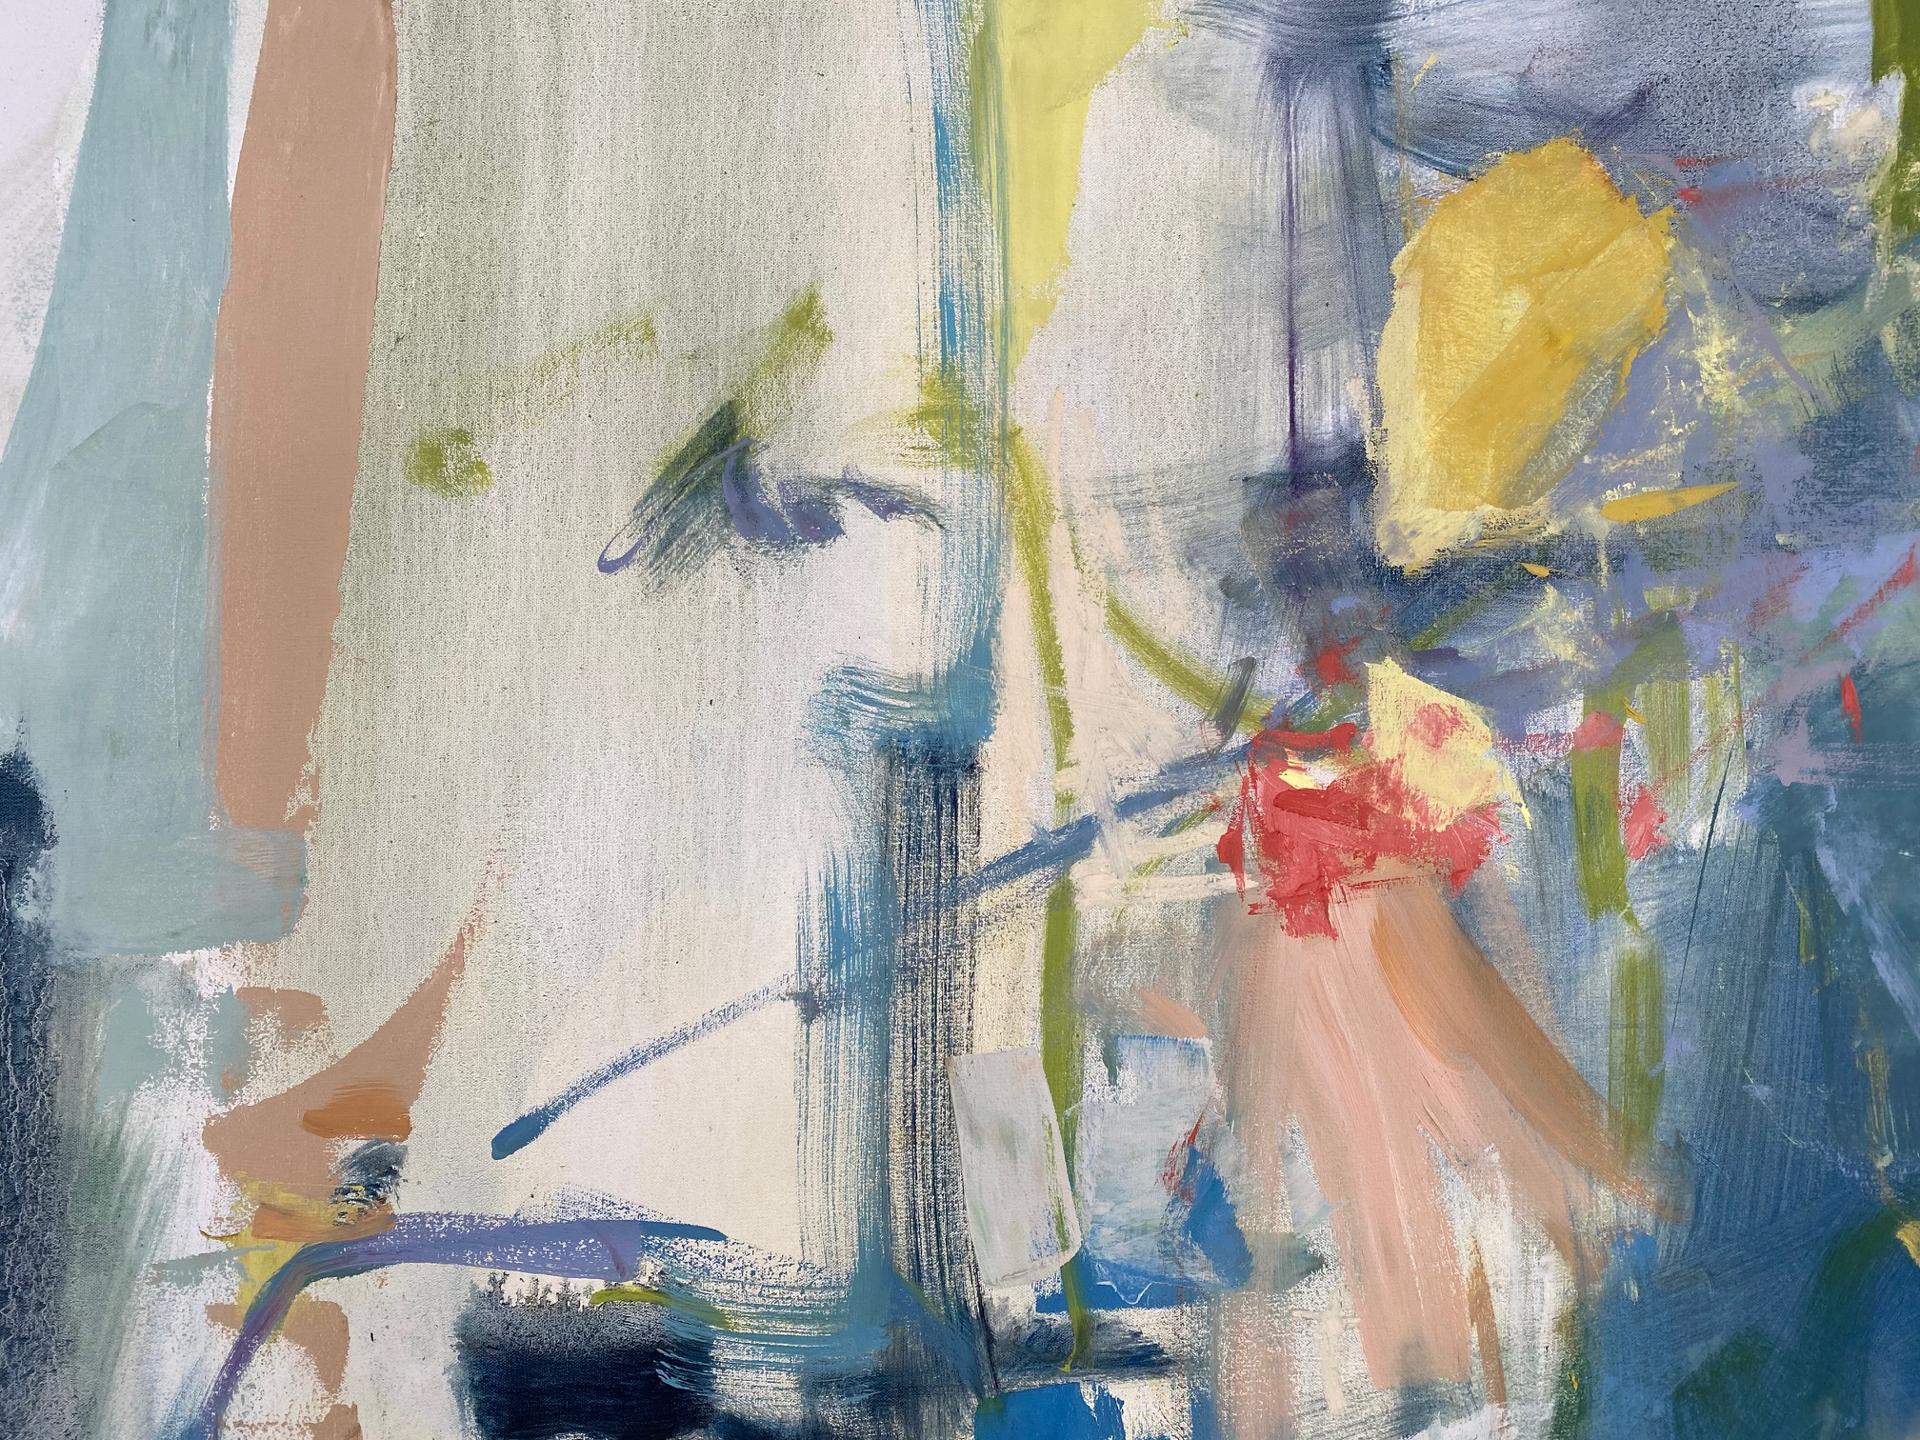 Amber Breeze by Marissa Vogl